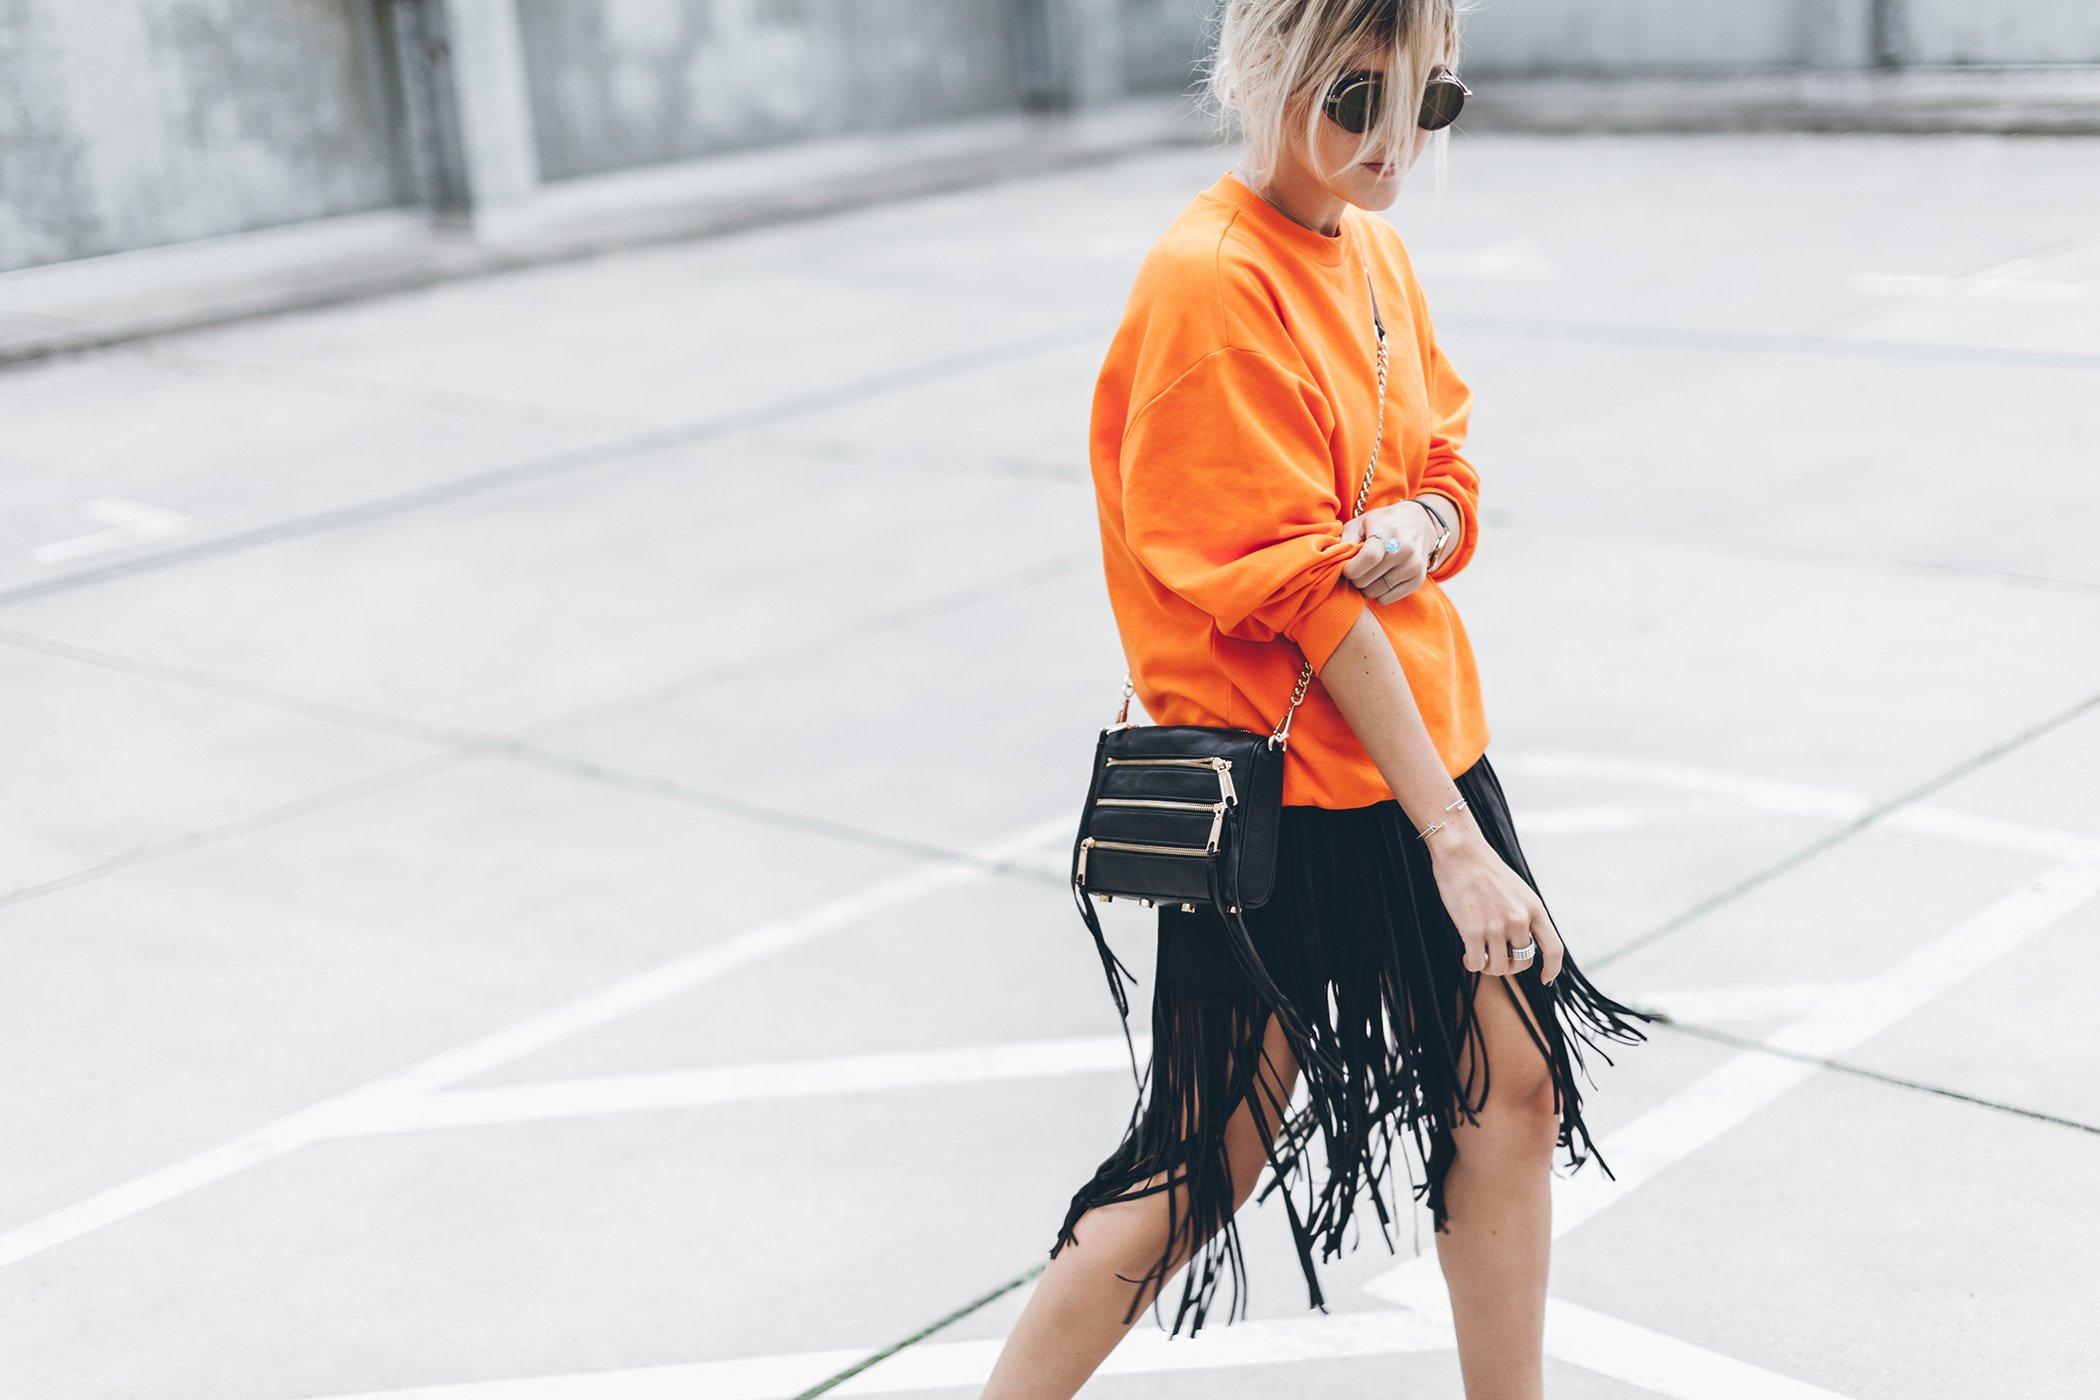 mikuta-fringe-skirt-orange-sweater-2